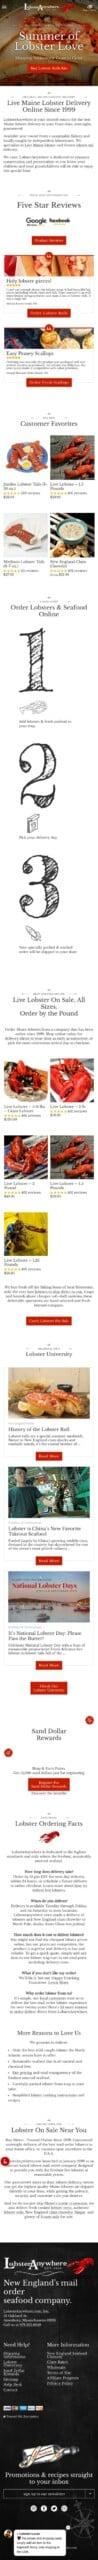 LobsterAnywhere.com Coupon